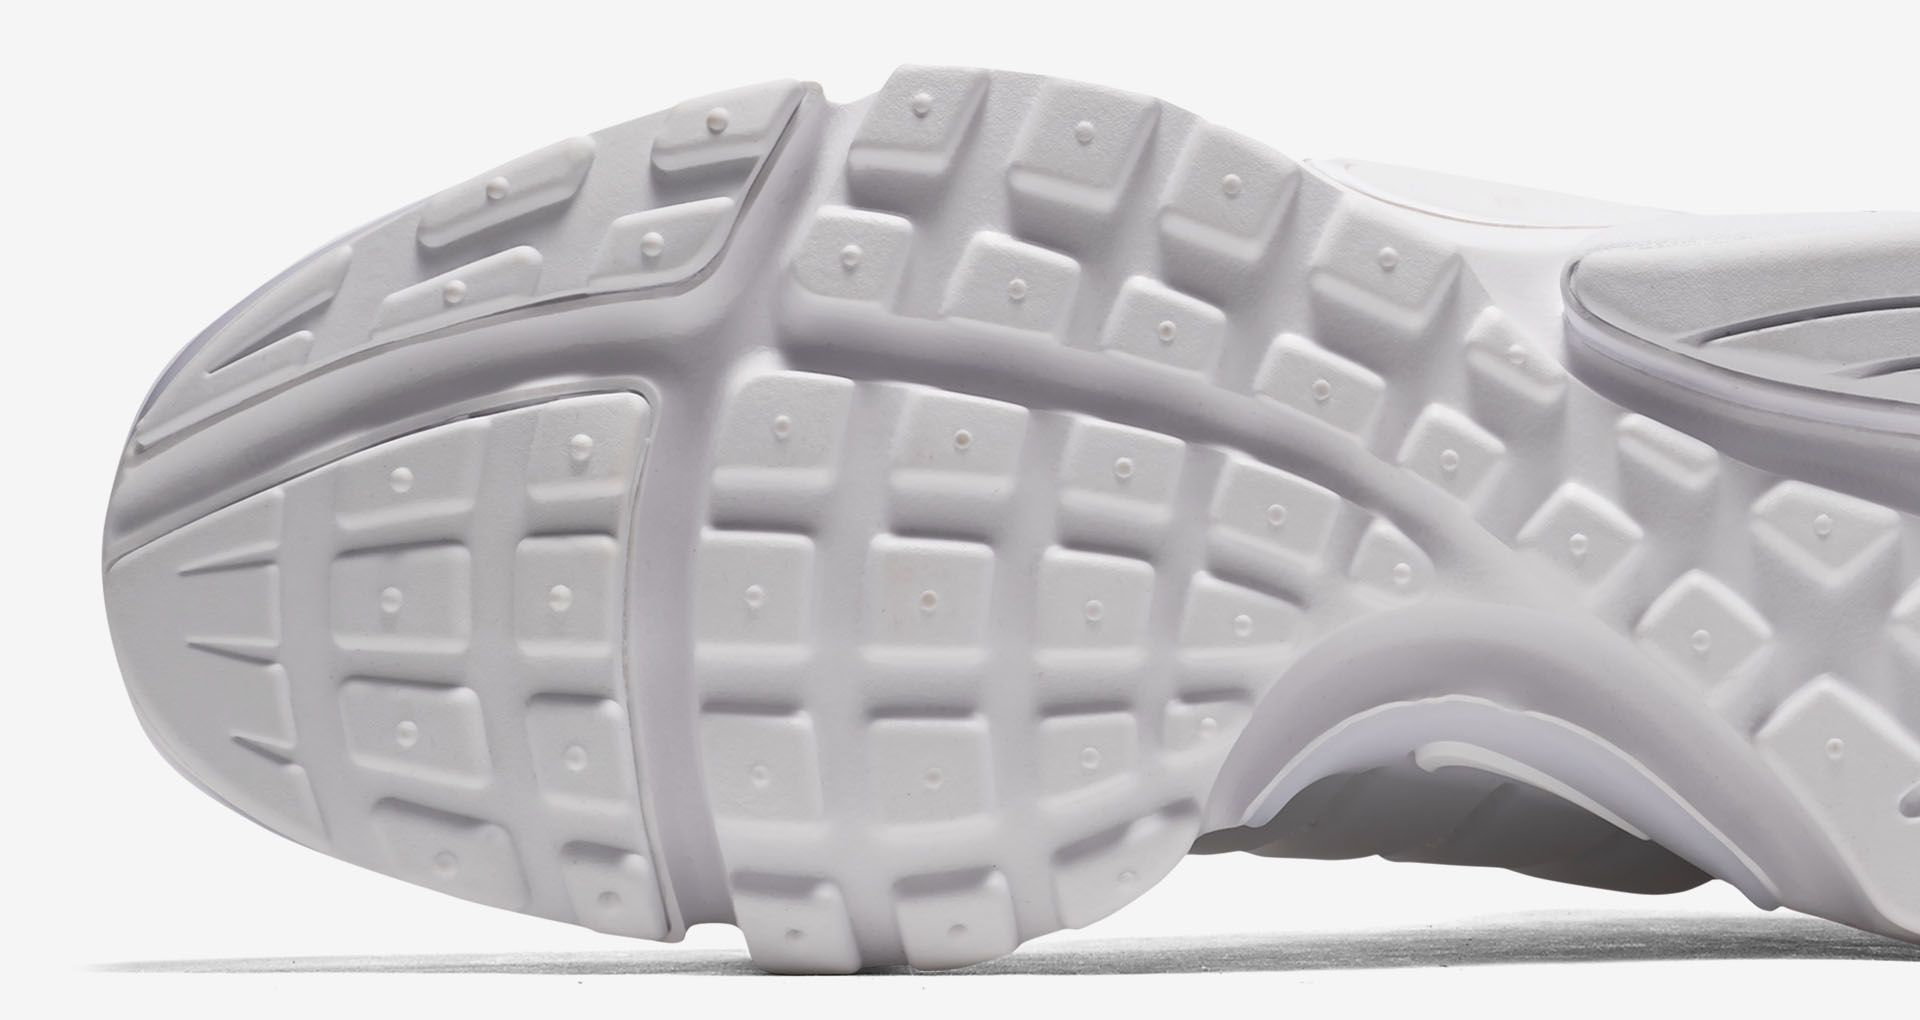 201cb898d71 Nike Air Presto Ultra Flyknit  Triple White  Release Date. Nike+ SNKRS